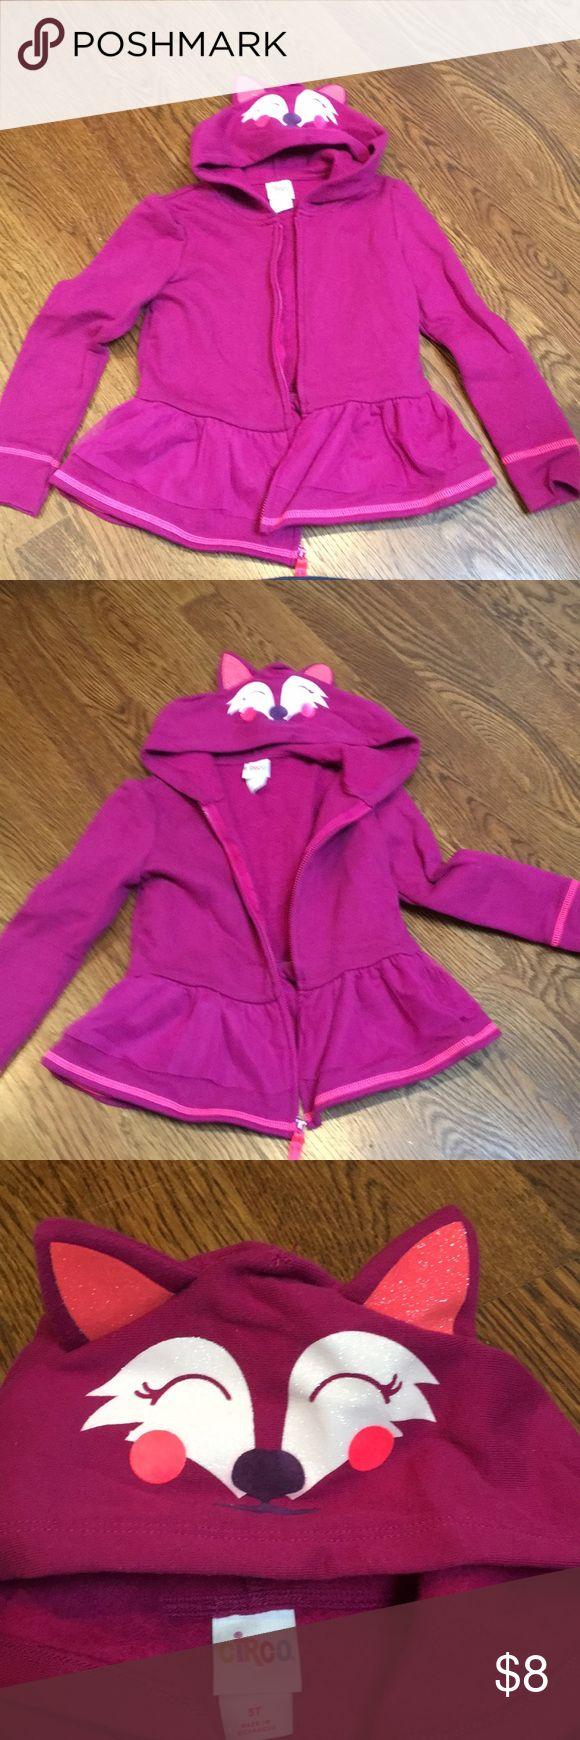 "Circo toddler girls zip-up hoodie w/ ""animal"" hood Cute peplum hoodie with animal print with ears on hood Circo Shirts & Tops Sweatshirts & Hoodies"